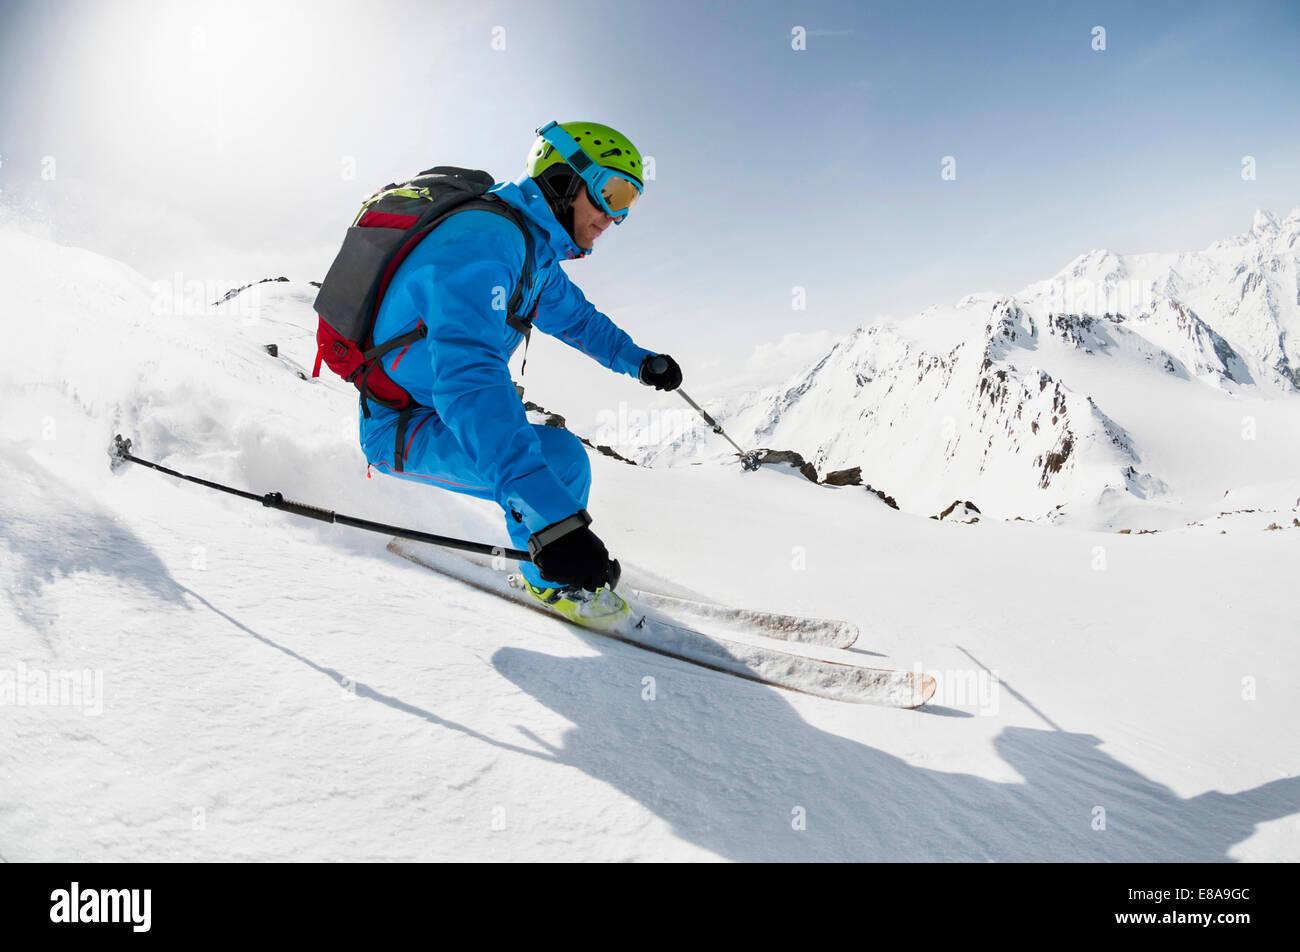 L'uomo sciatore sci discesa pendio ripido Alpi Immagini Stock